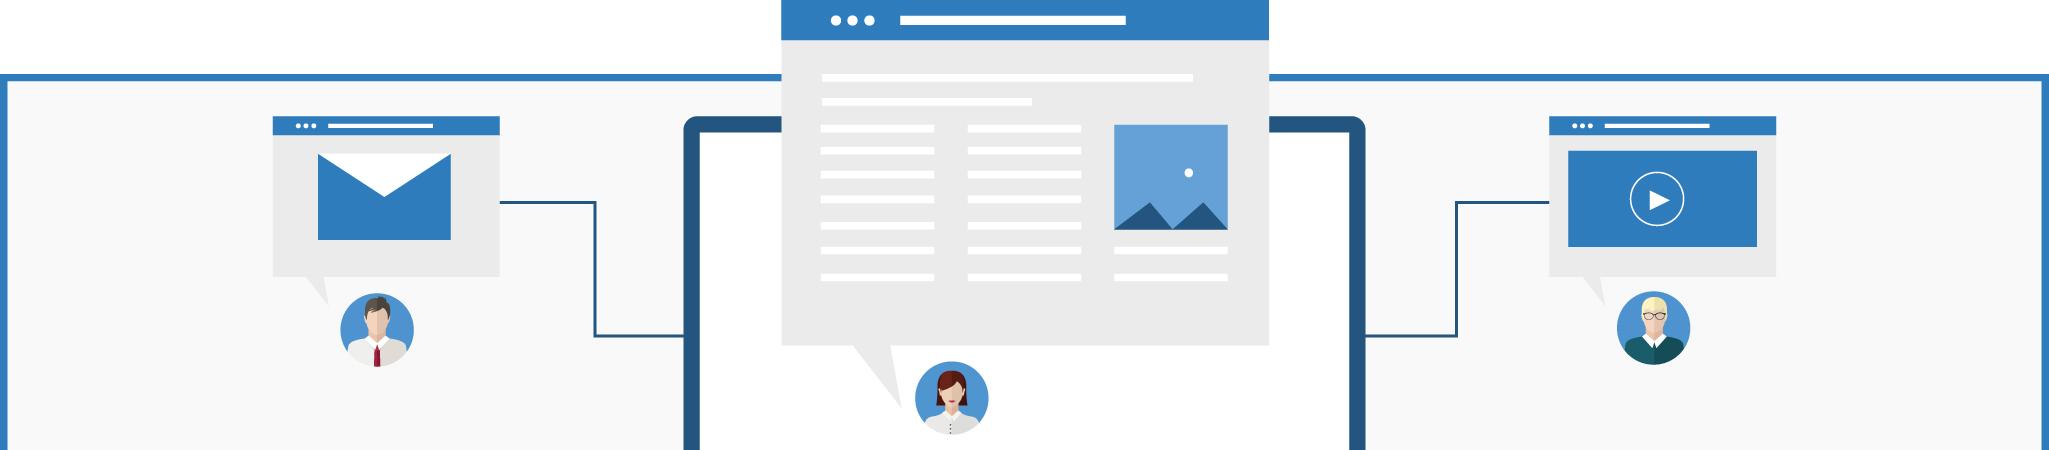 content marketing infographic banner desktop